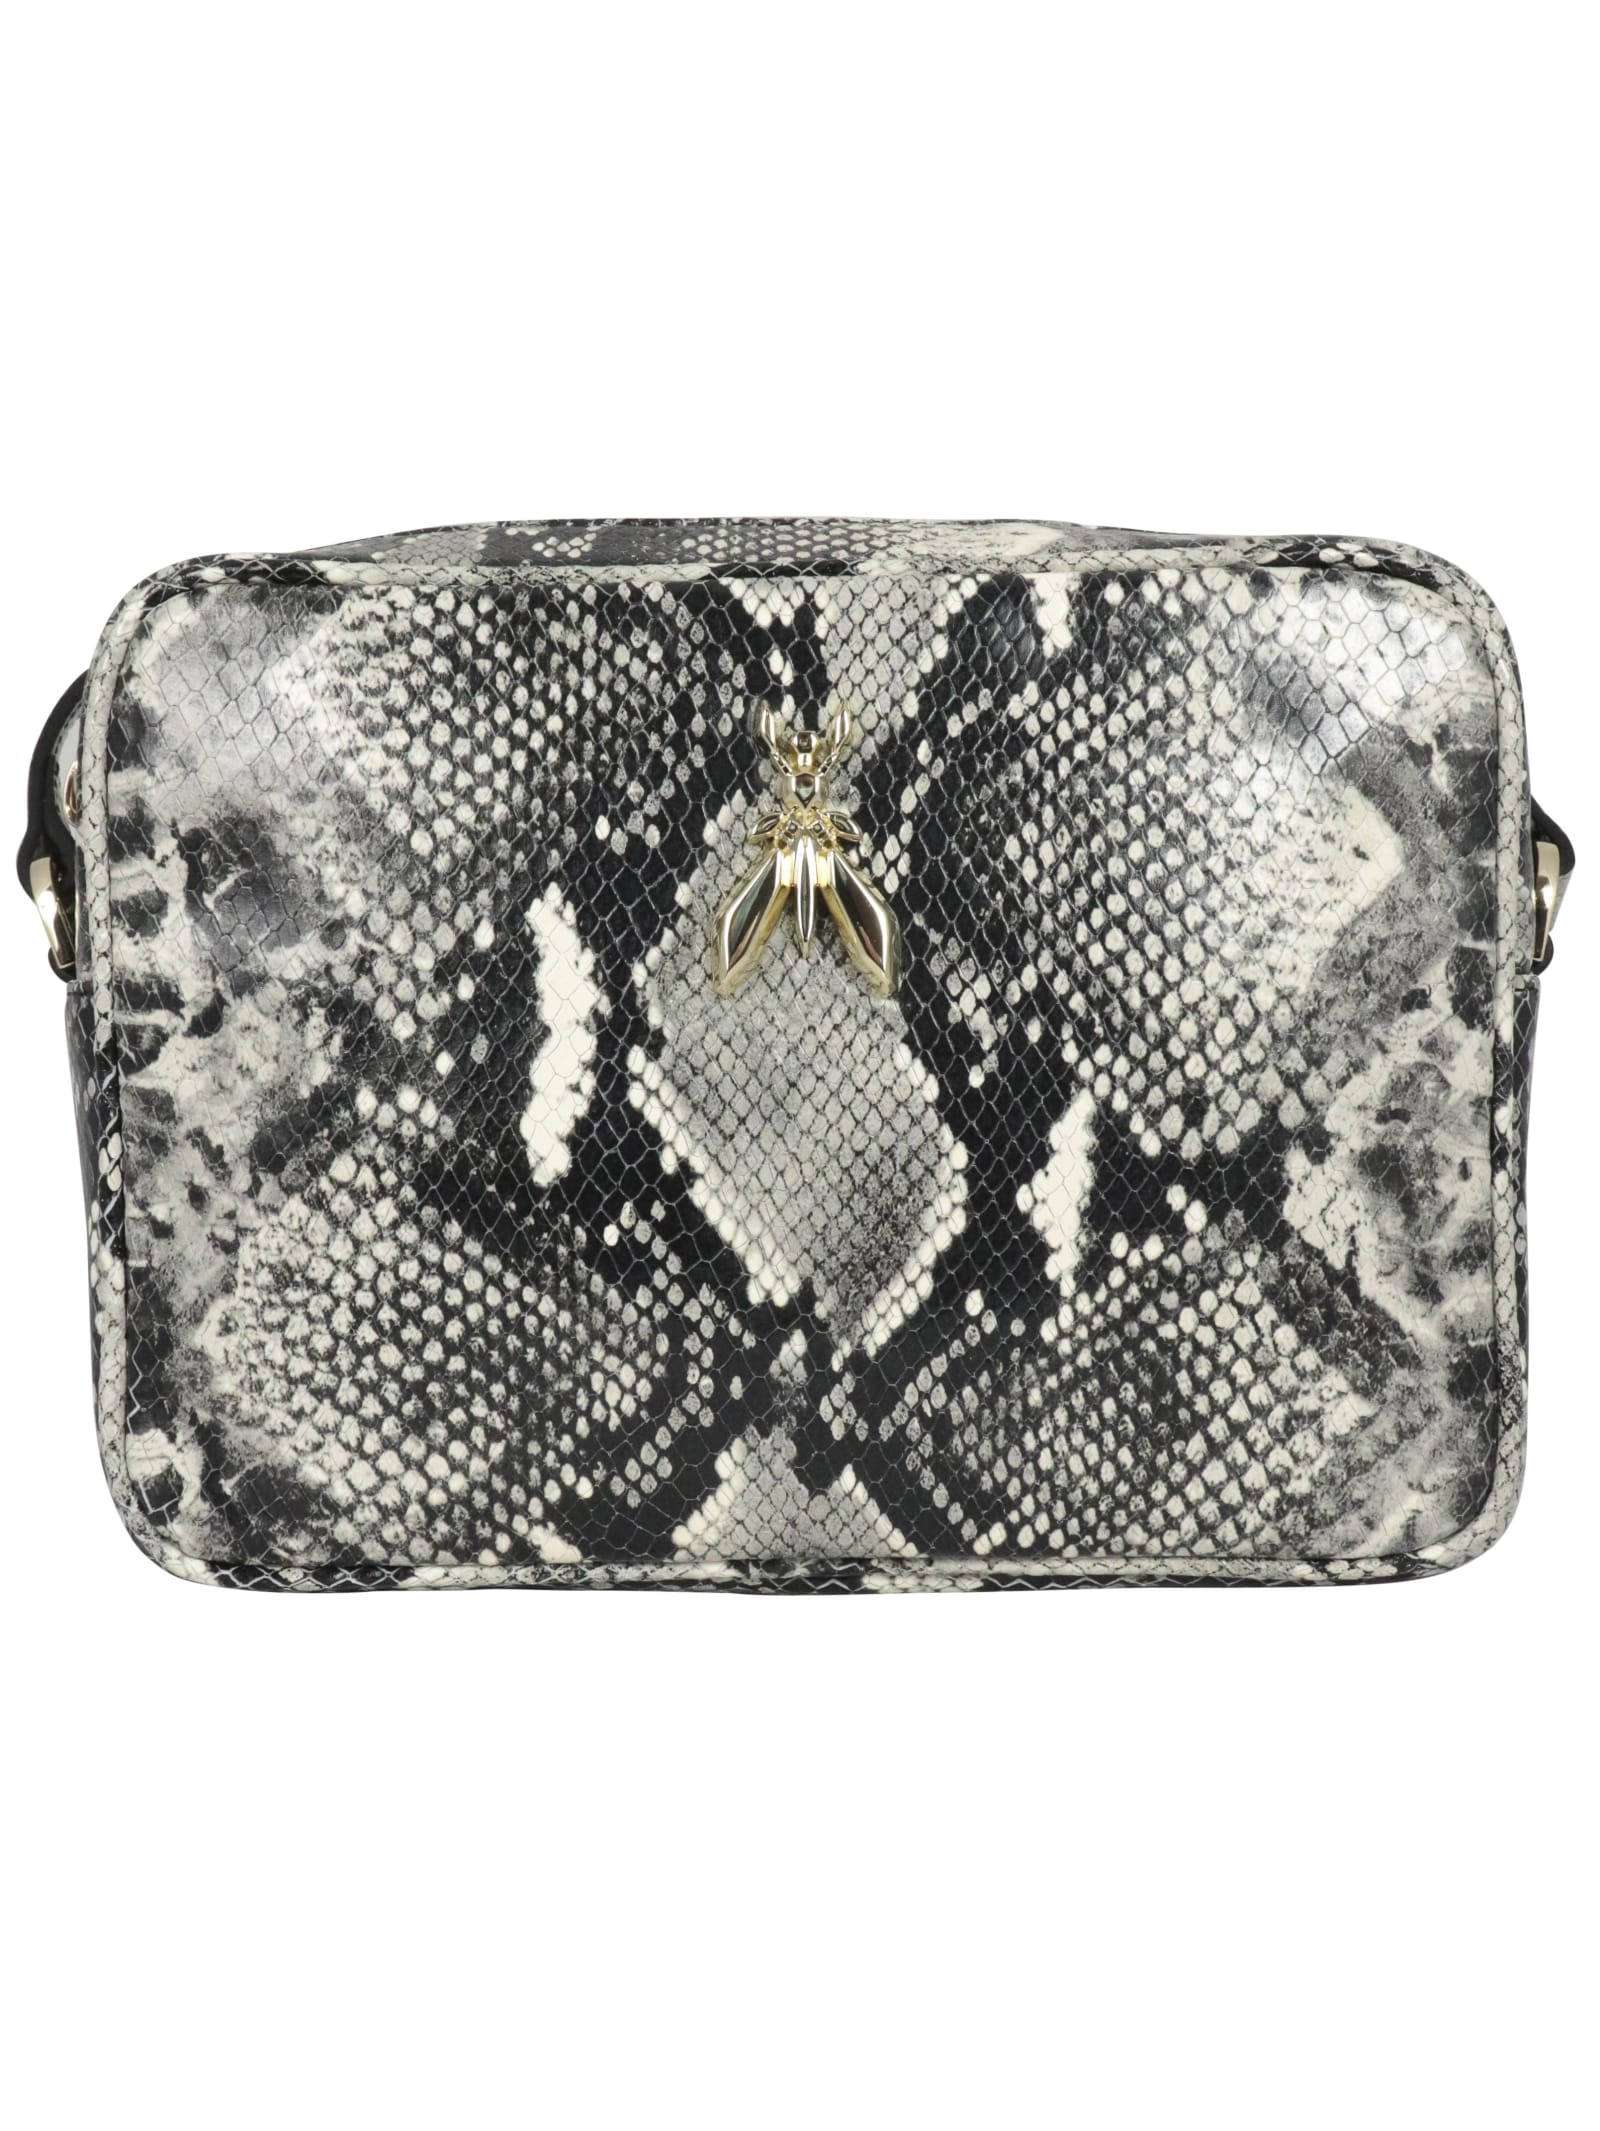 Patrizia Pepe Natural Python Shoulder Bag